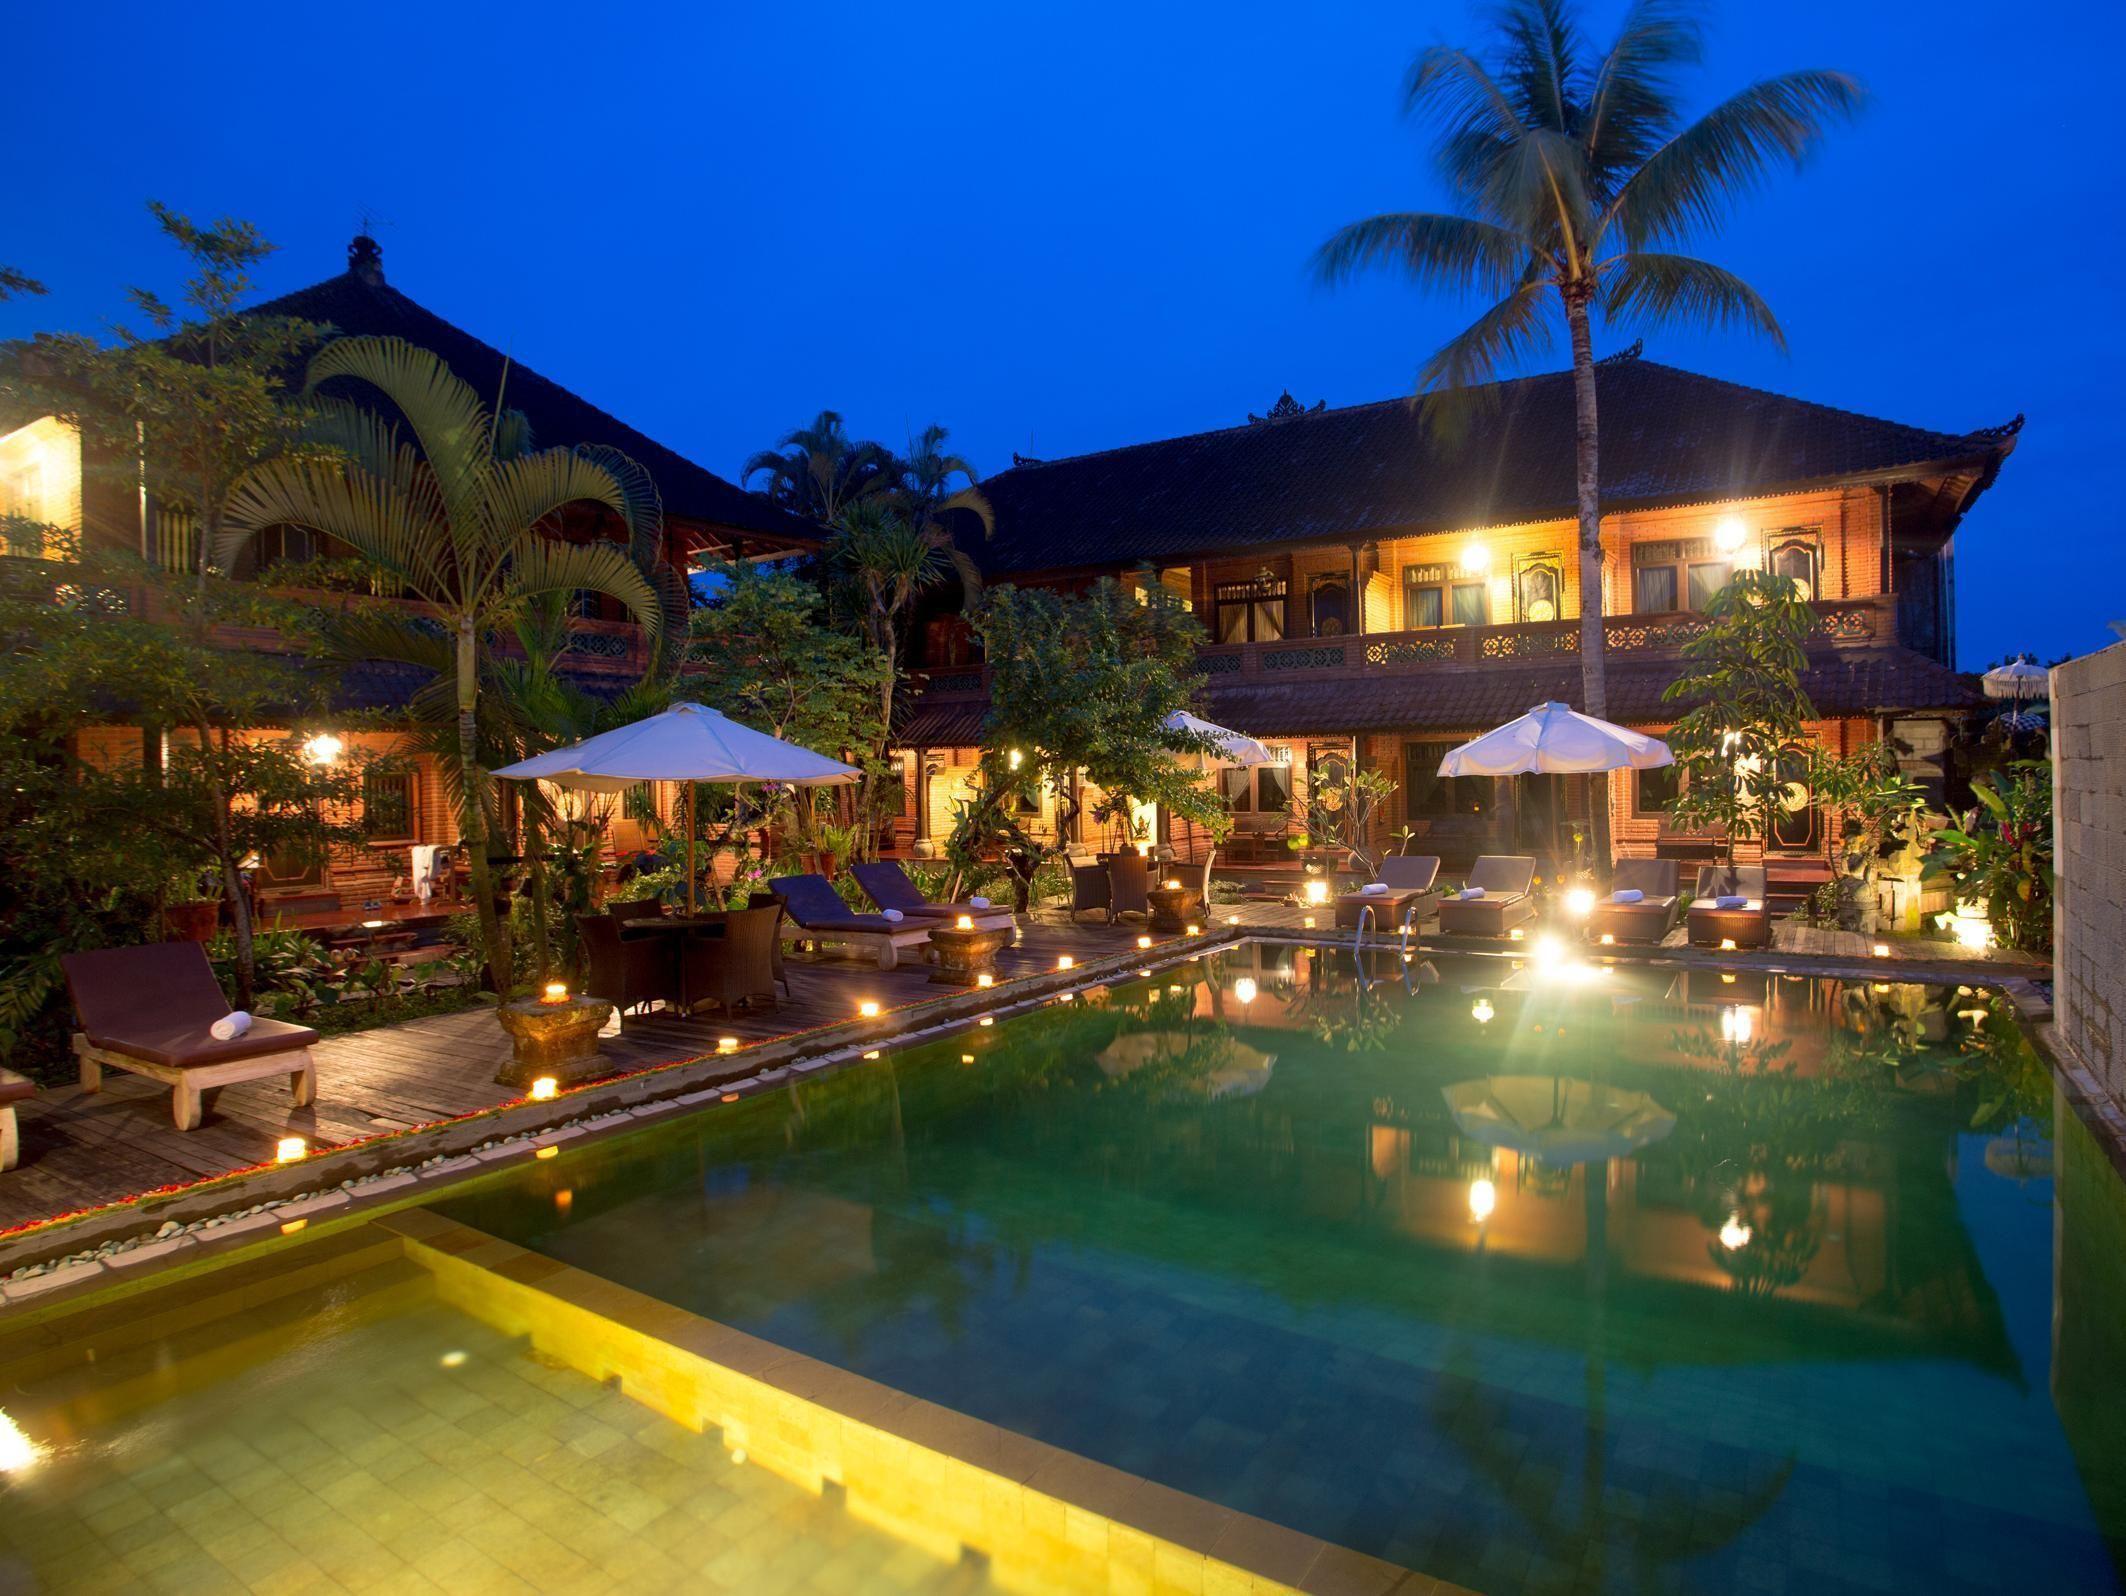 Bali Puri Garden Hotel Indonesia, Asia Set in a prime location of ...